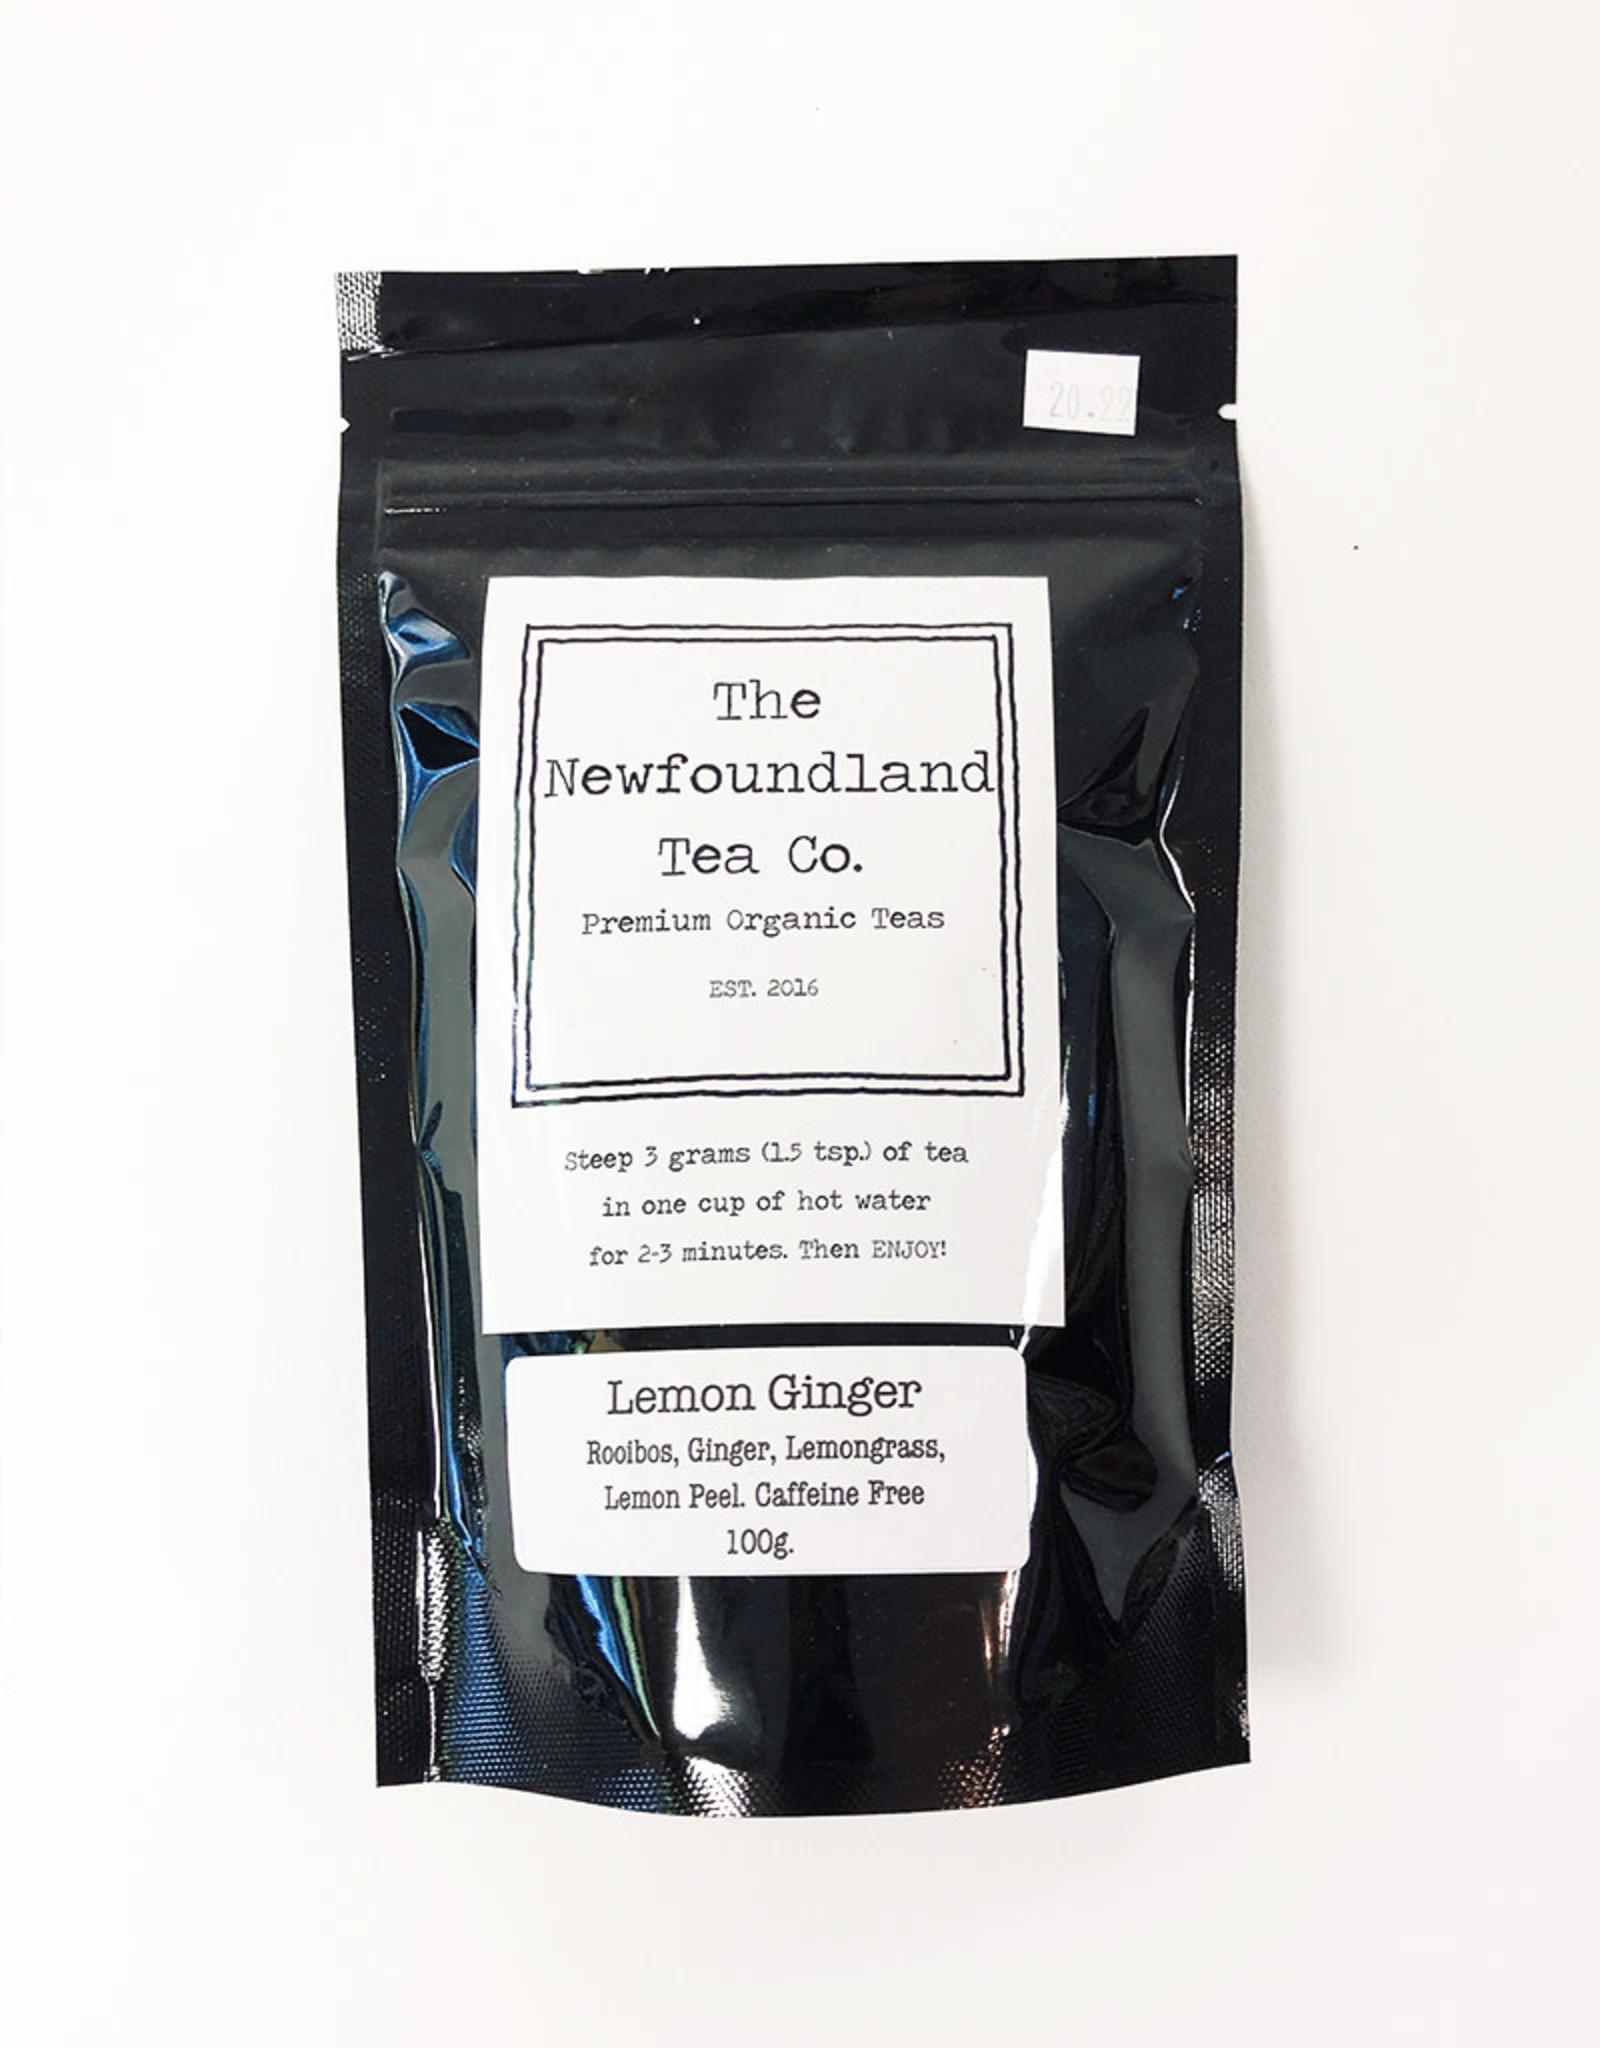 Newfoundland Tea Co. Newfoundland Tea Co. - Lemon Ginger